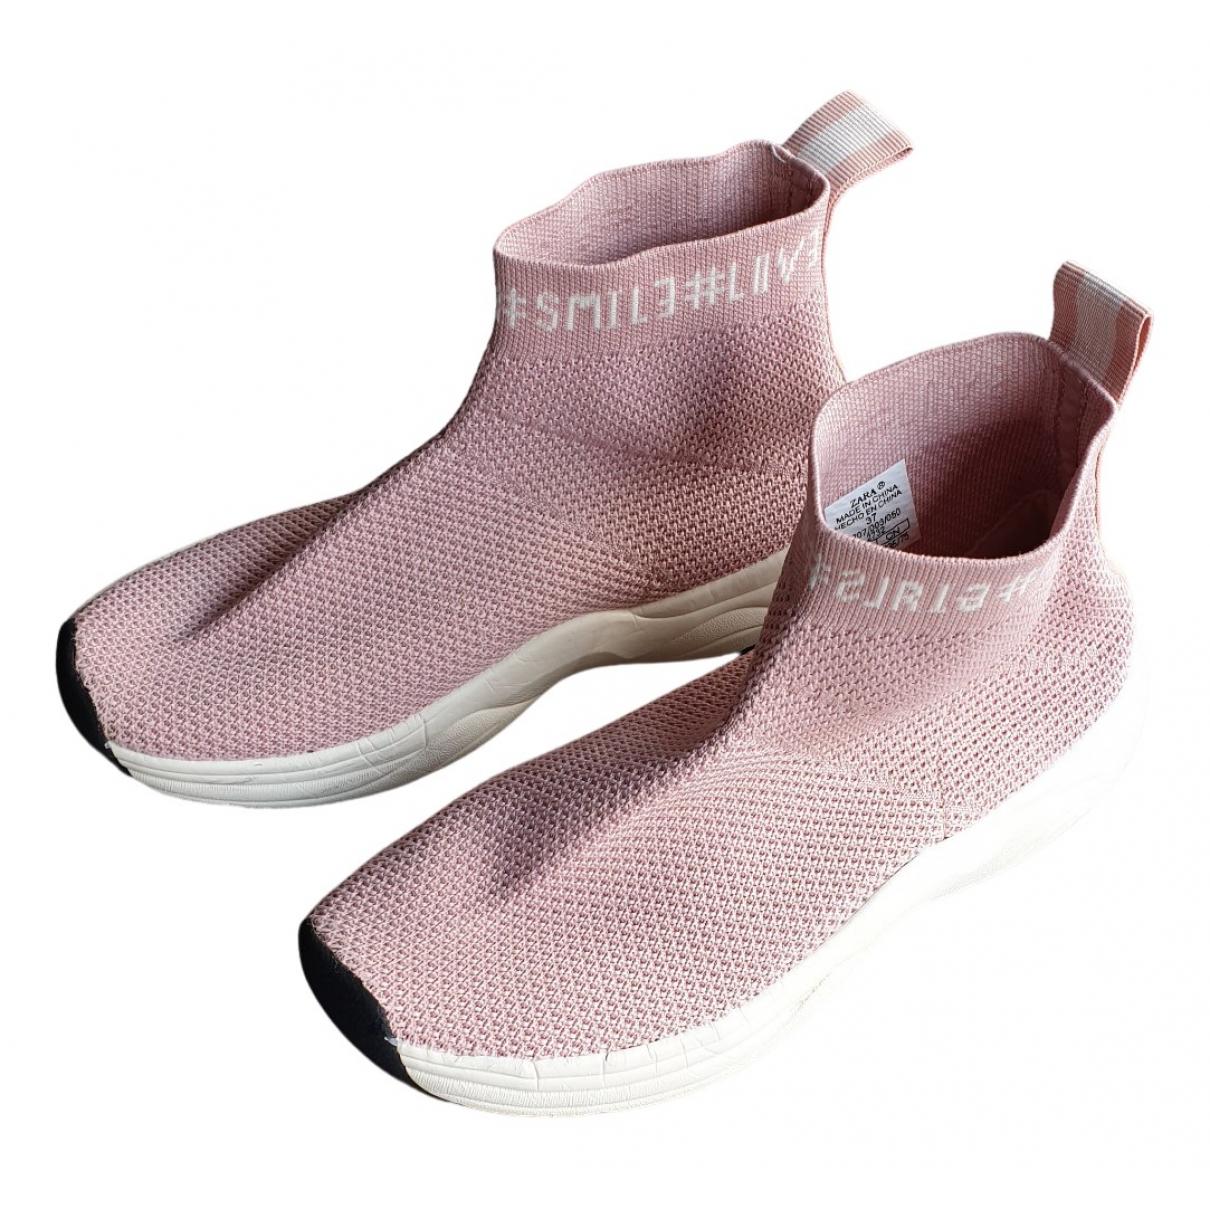 Zara - Baskets   pour enfant - rose